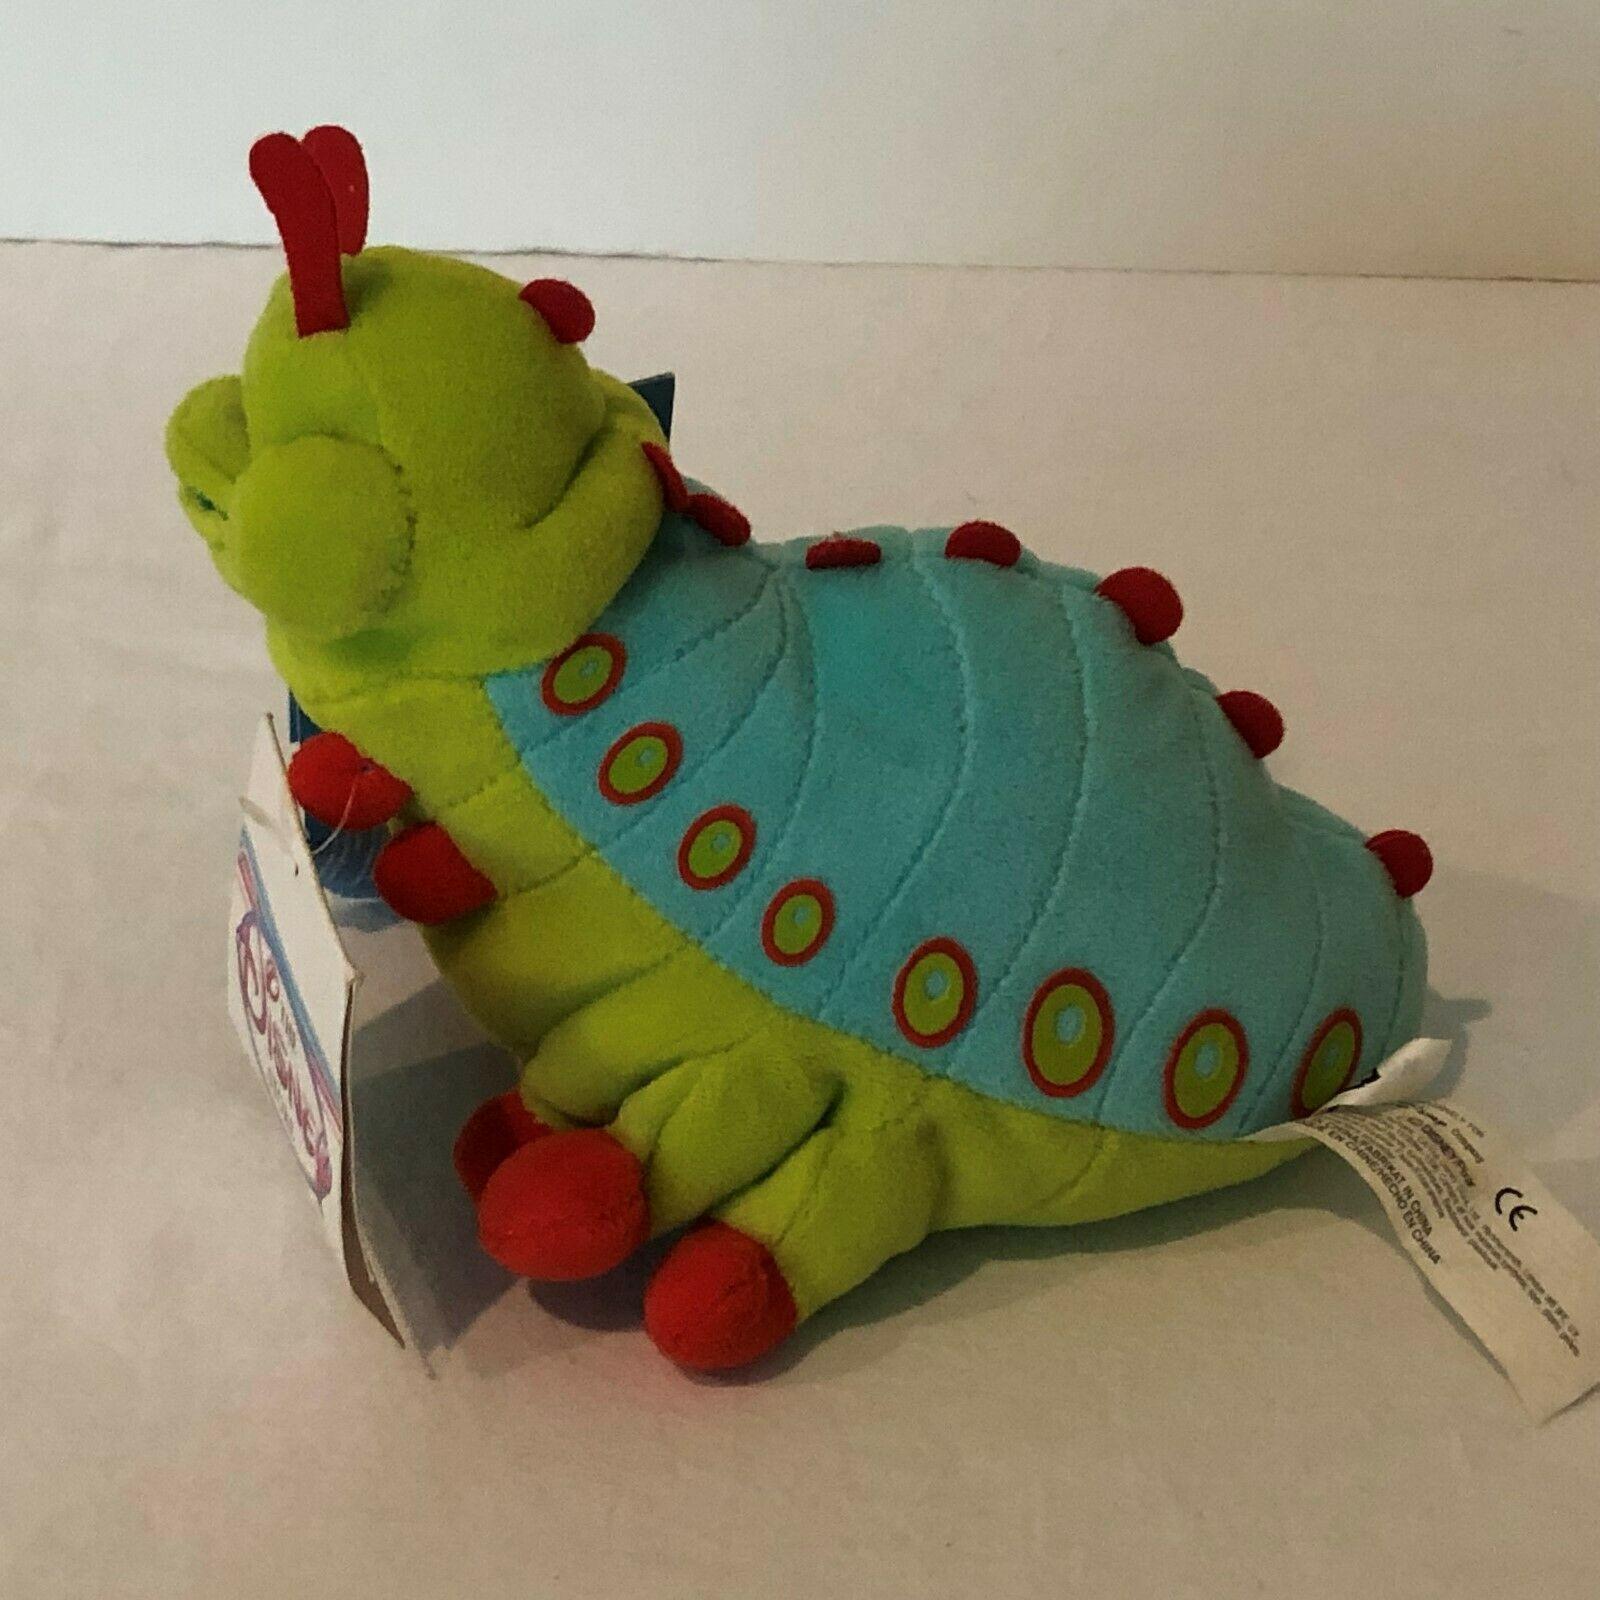 "Disney Store A Bugs Life Heimlich Caterpillar Beanie Plush Stuffed Animal 8"" image 2"